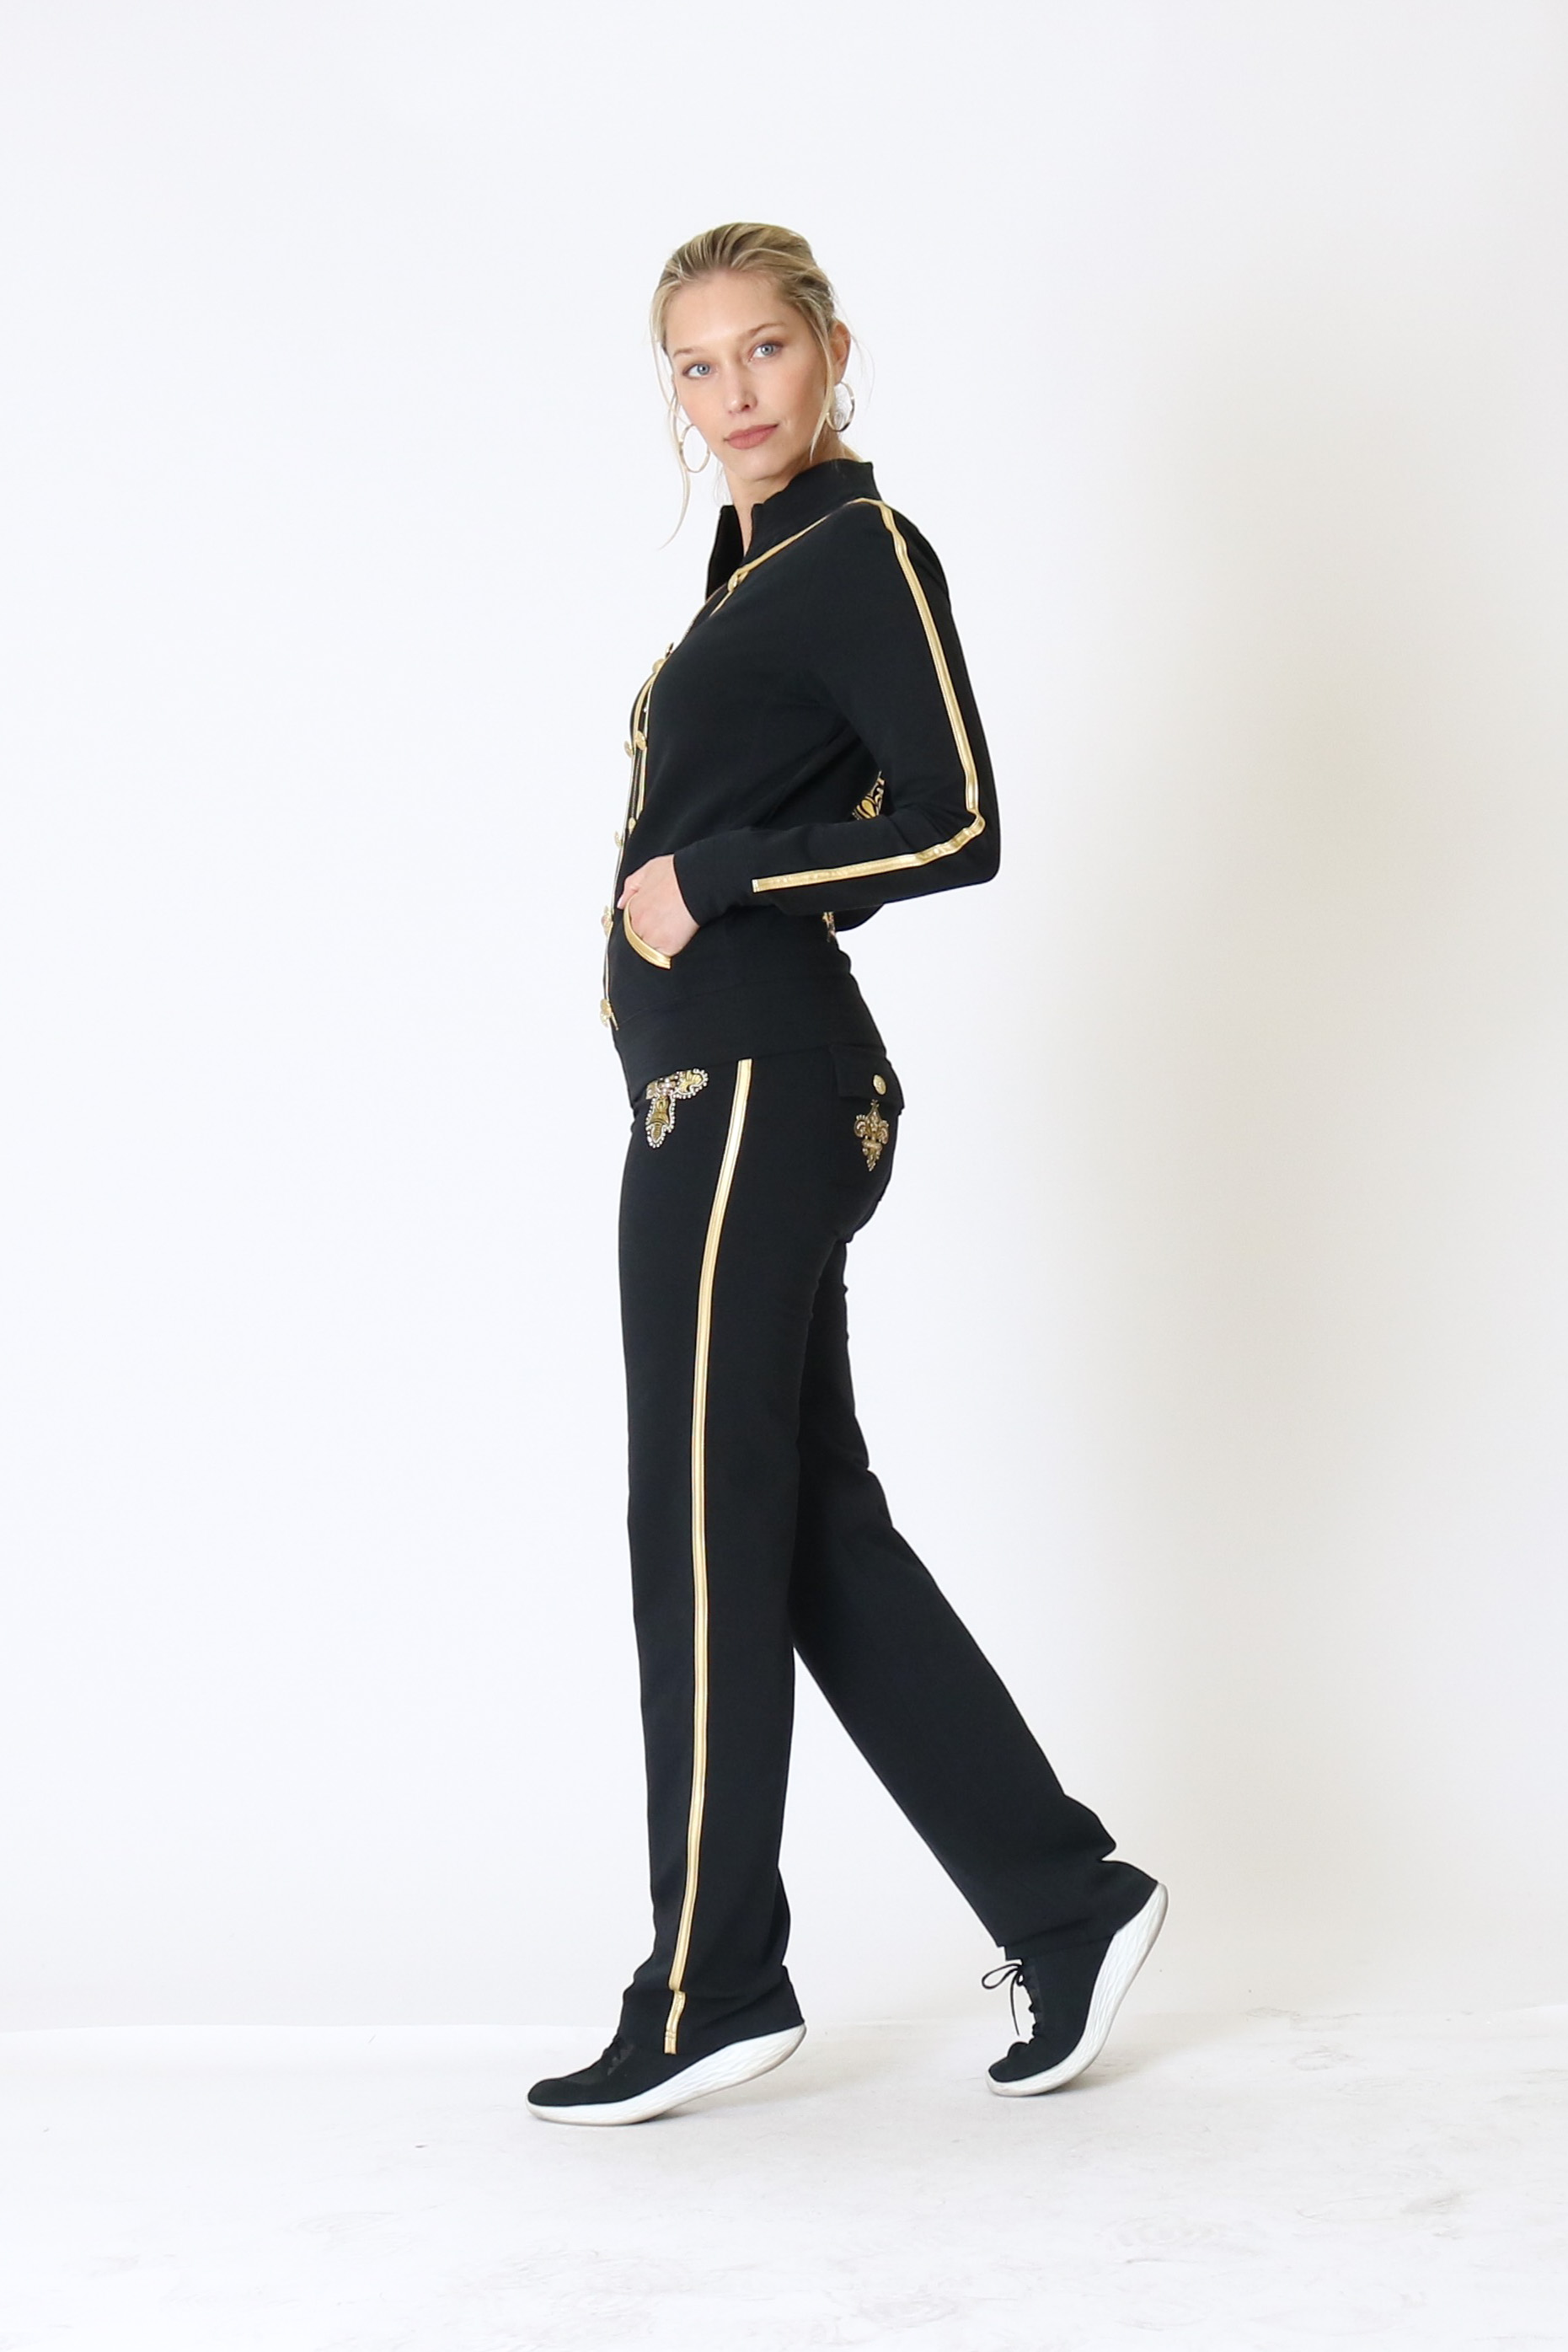 BCBG-Women-039-s-Lounge-Wear-2-Piece-Embellished-Jacket-and-Pants-Jogger-Set thumbnail 13